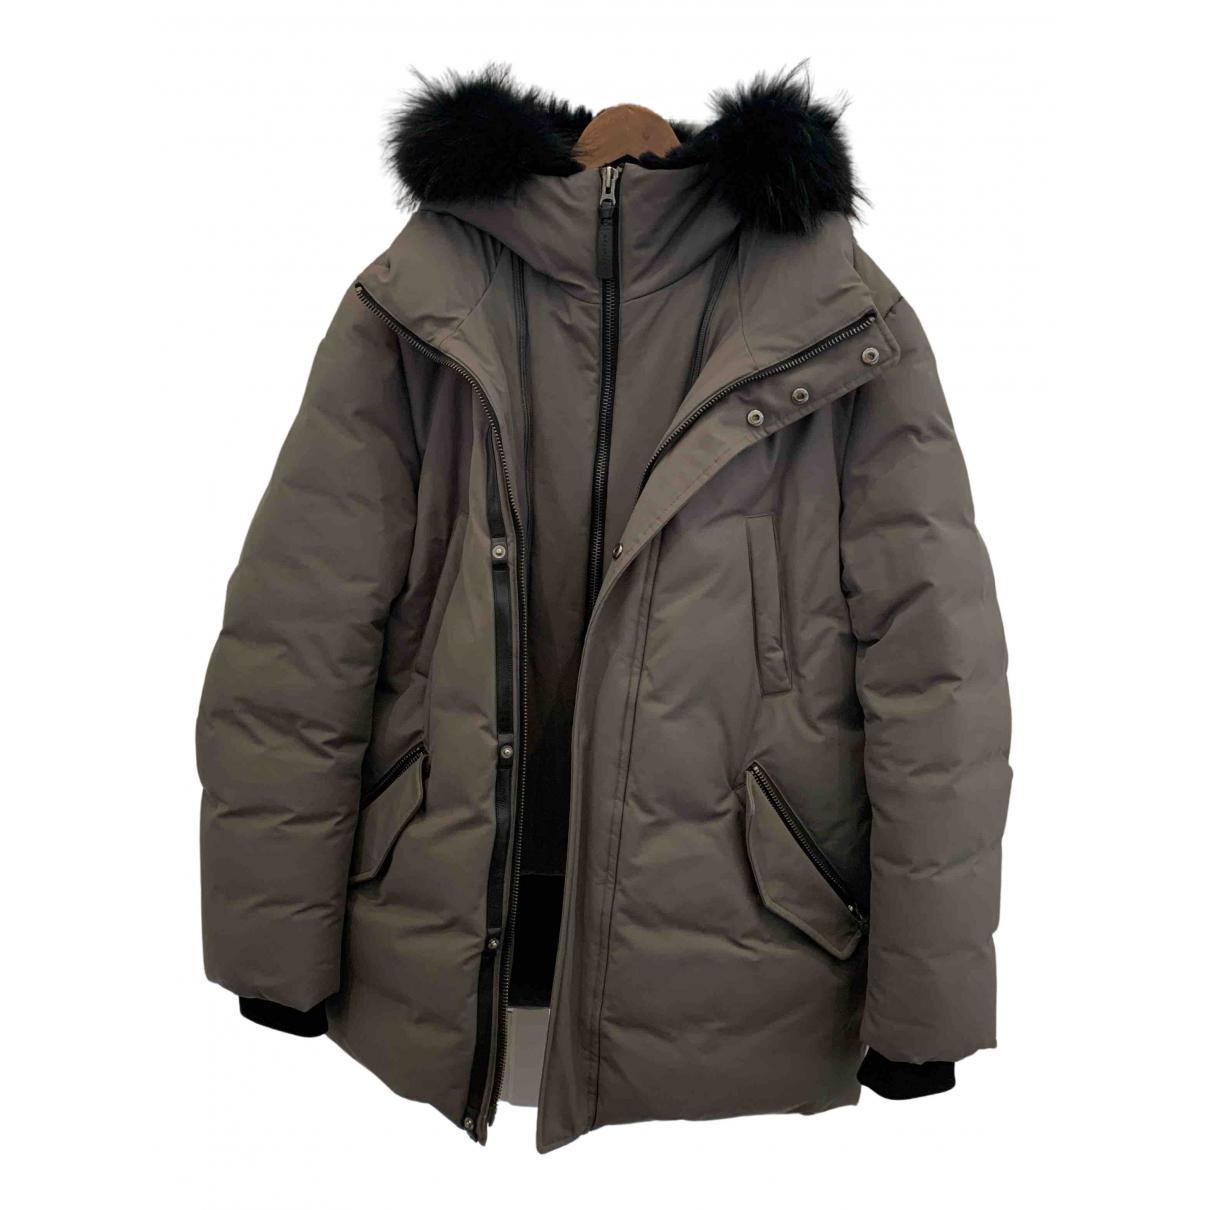 Mackage N Anthracite Cotton coat  for Men 42 UK - US